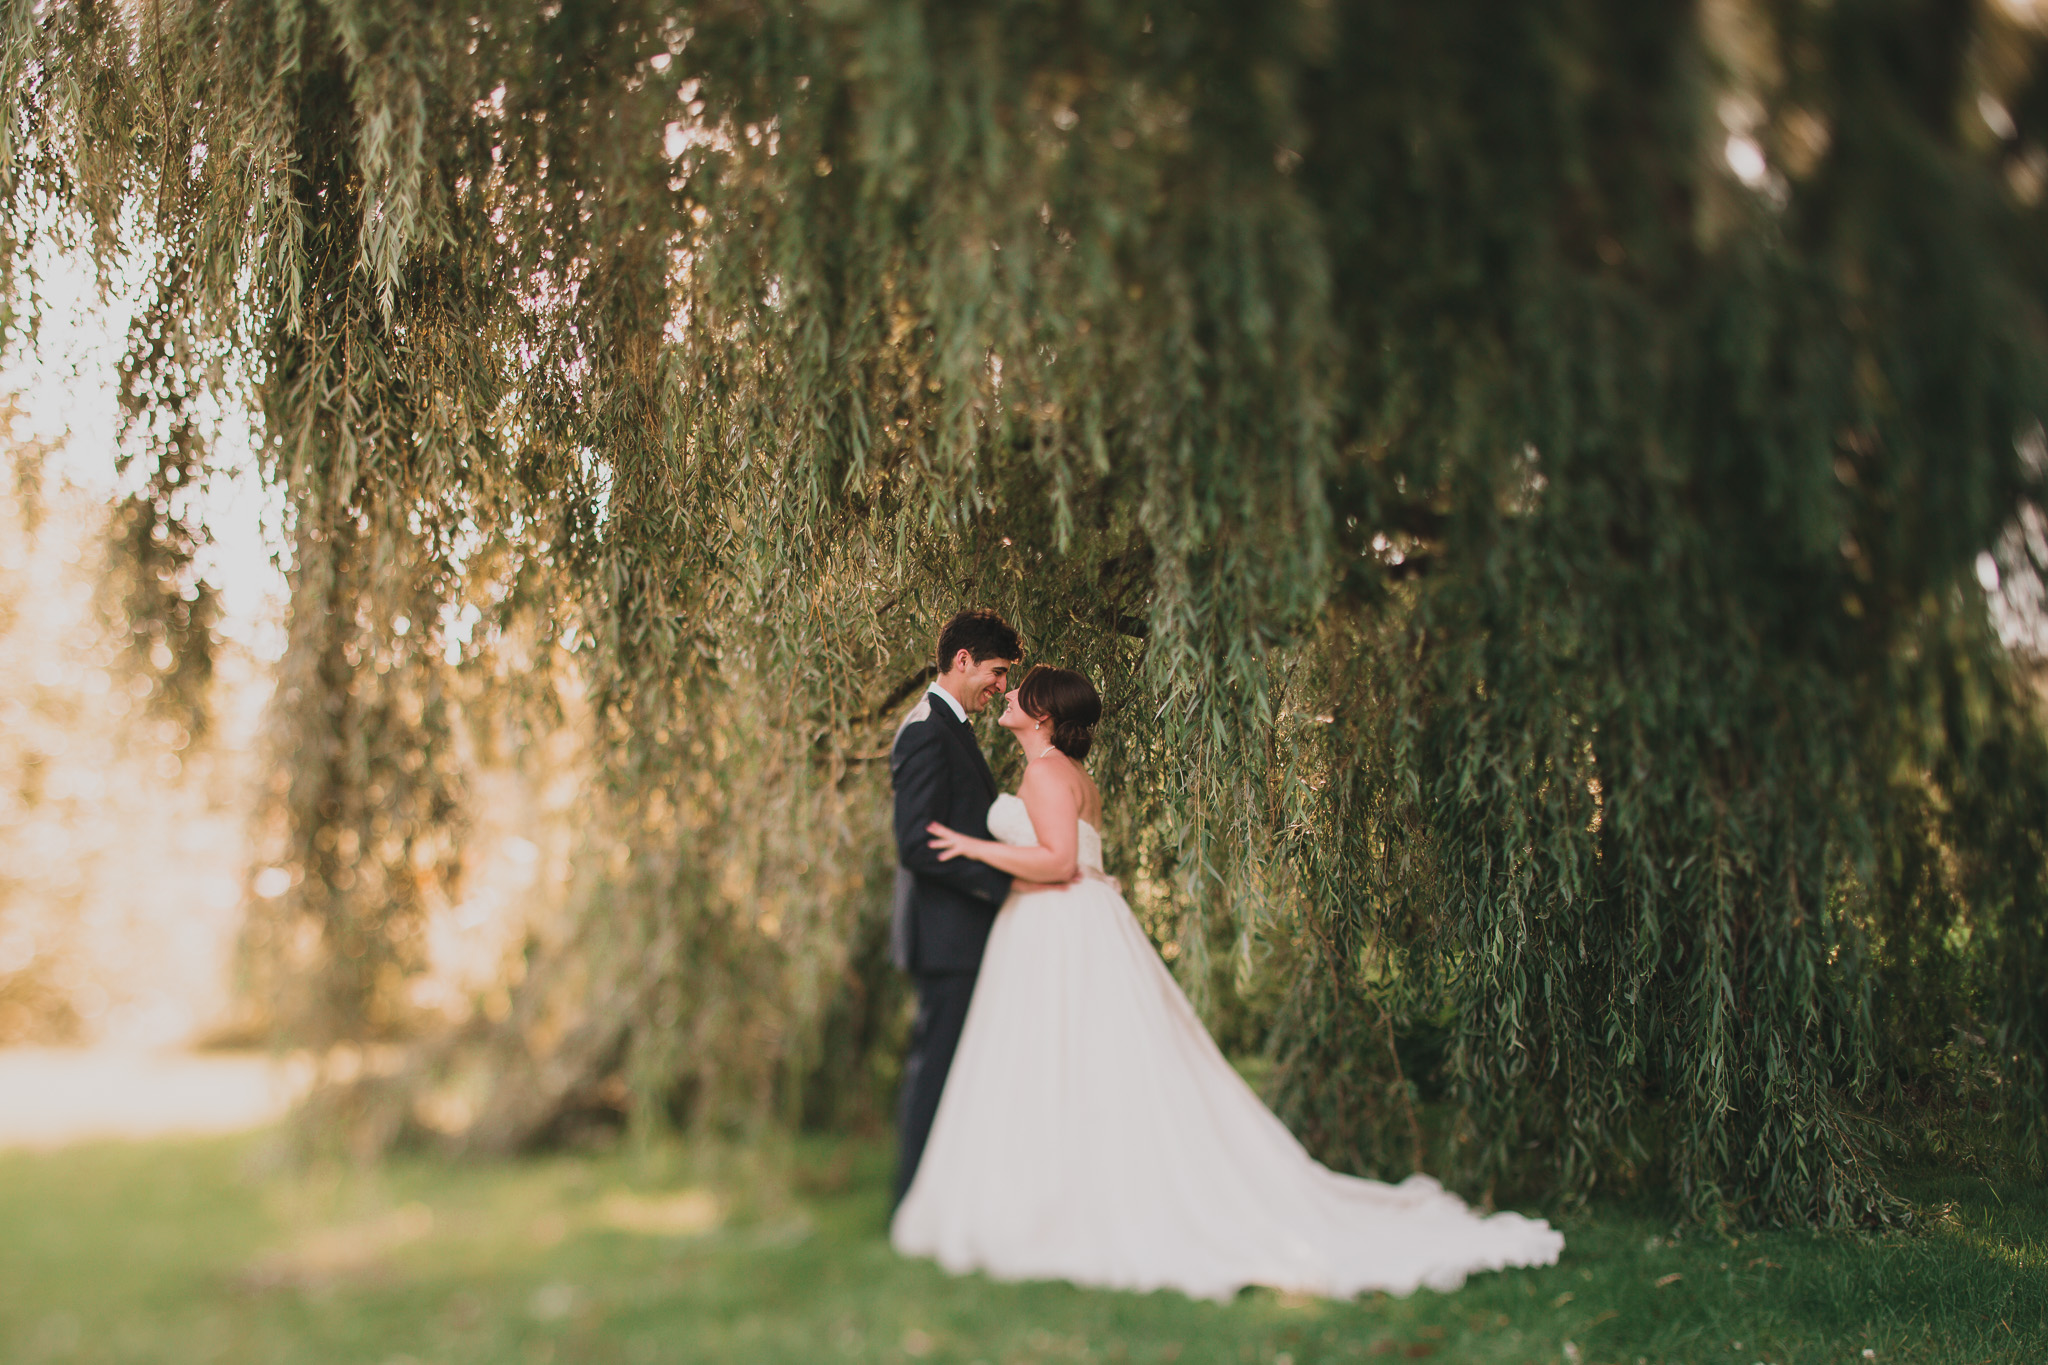 Alternative and artsy wedding in Ottawa, Ontario